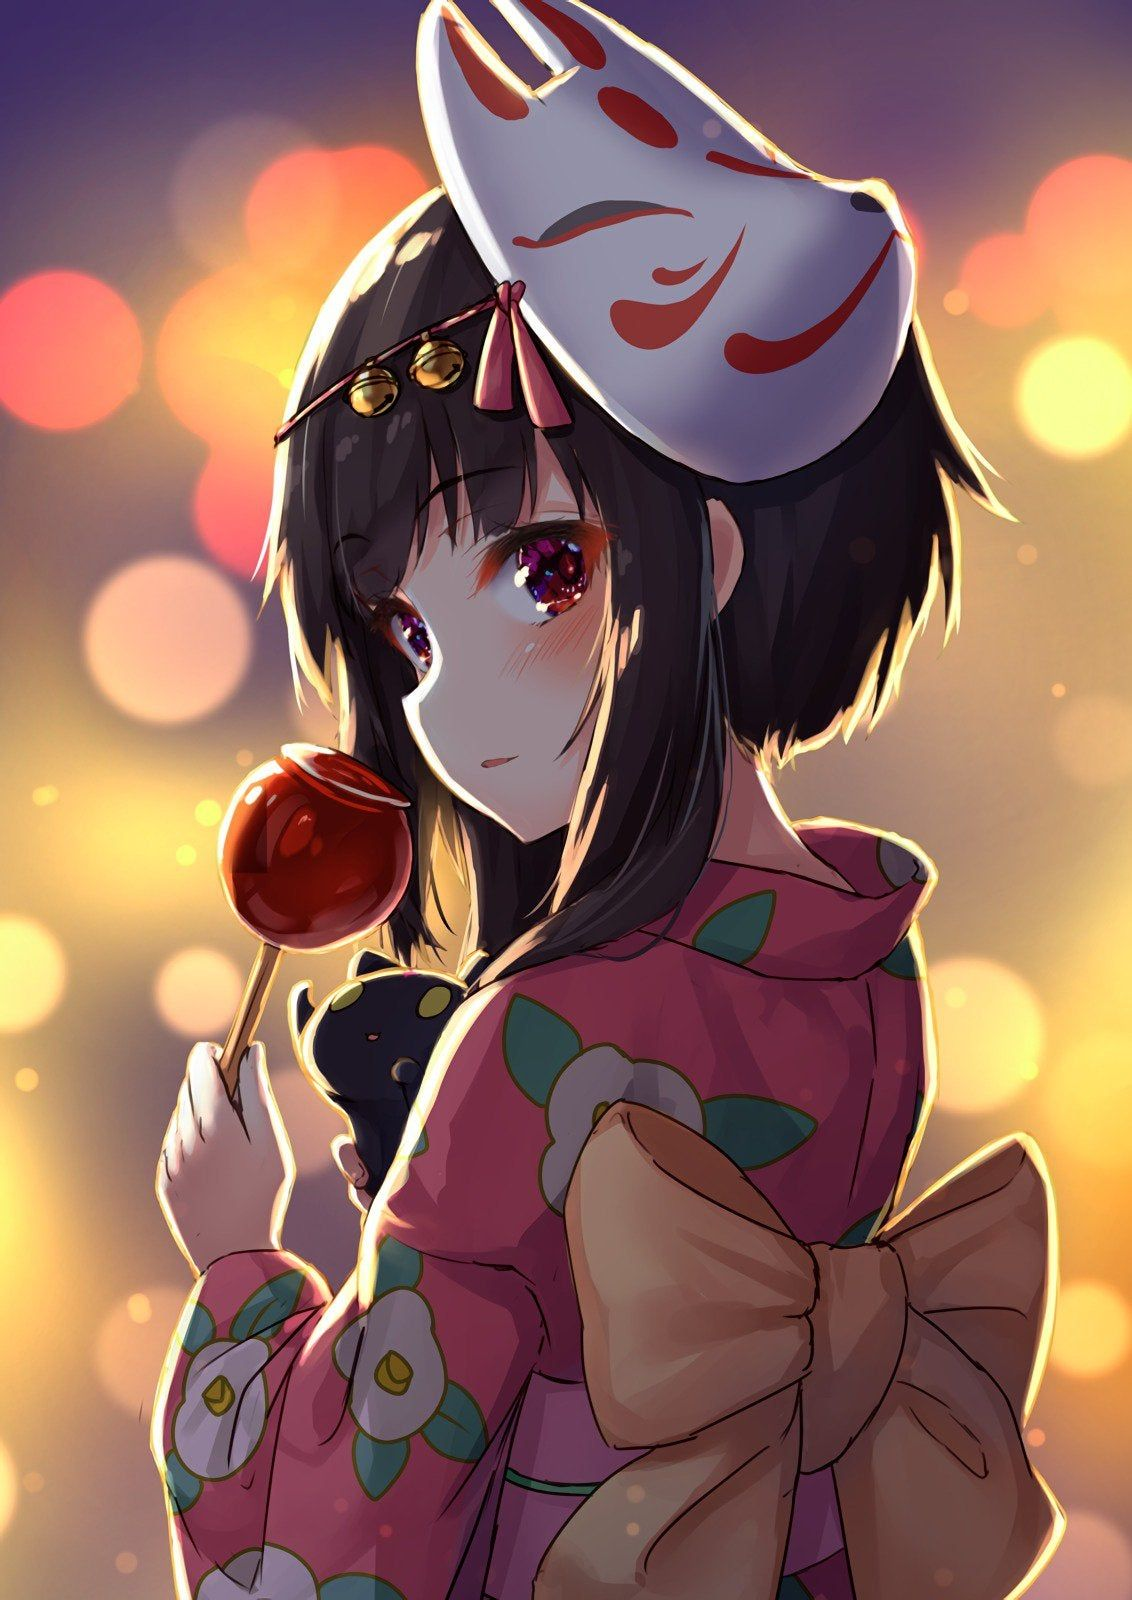 Eden of the East Anime scenery, Anime fanart, Kawaii anime